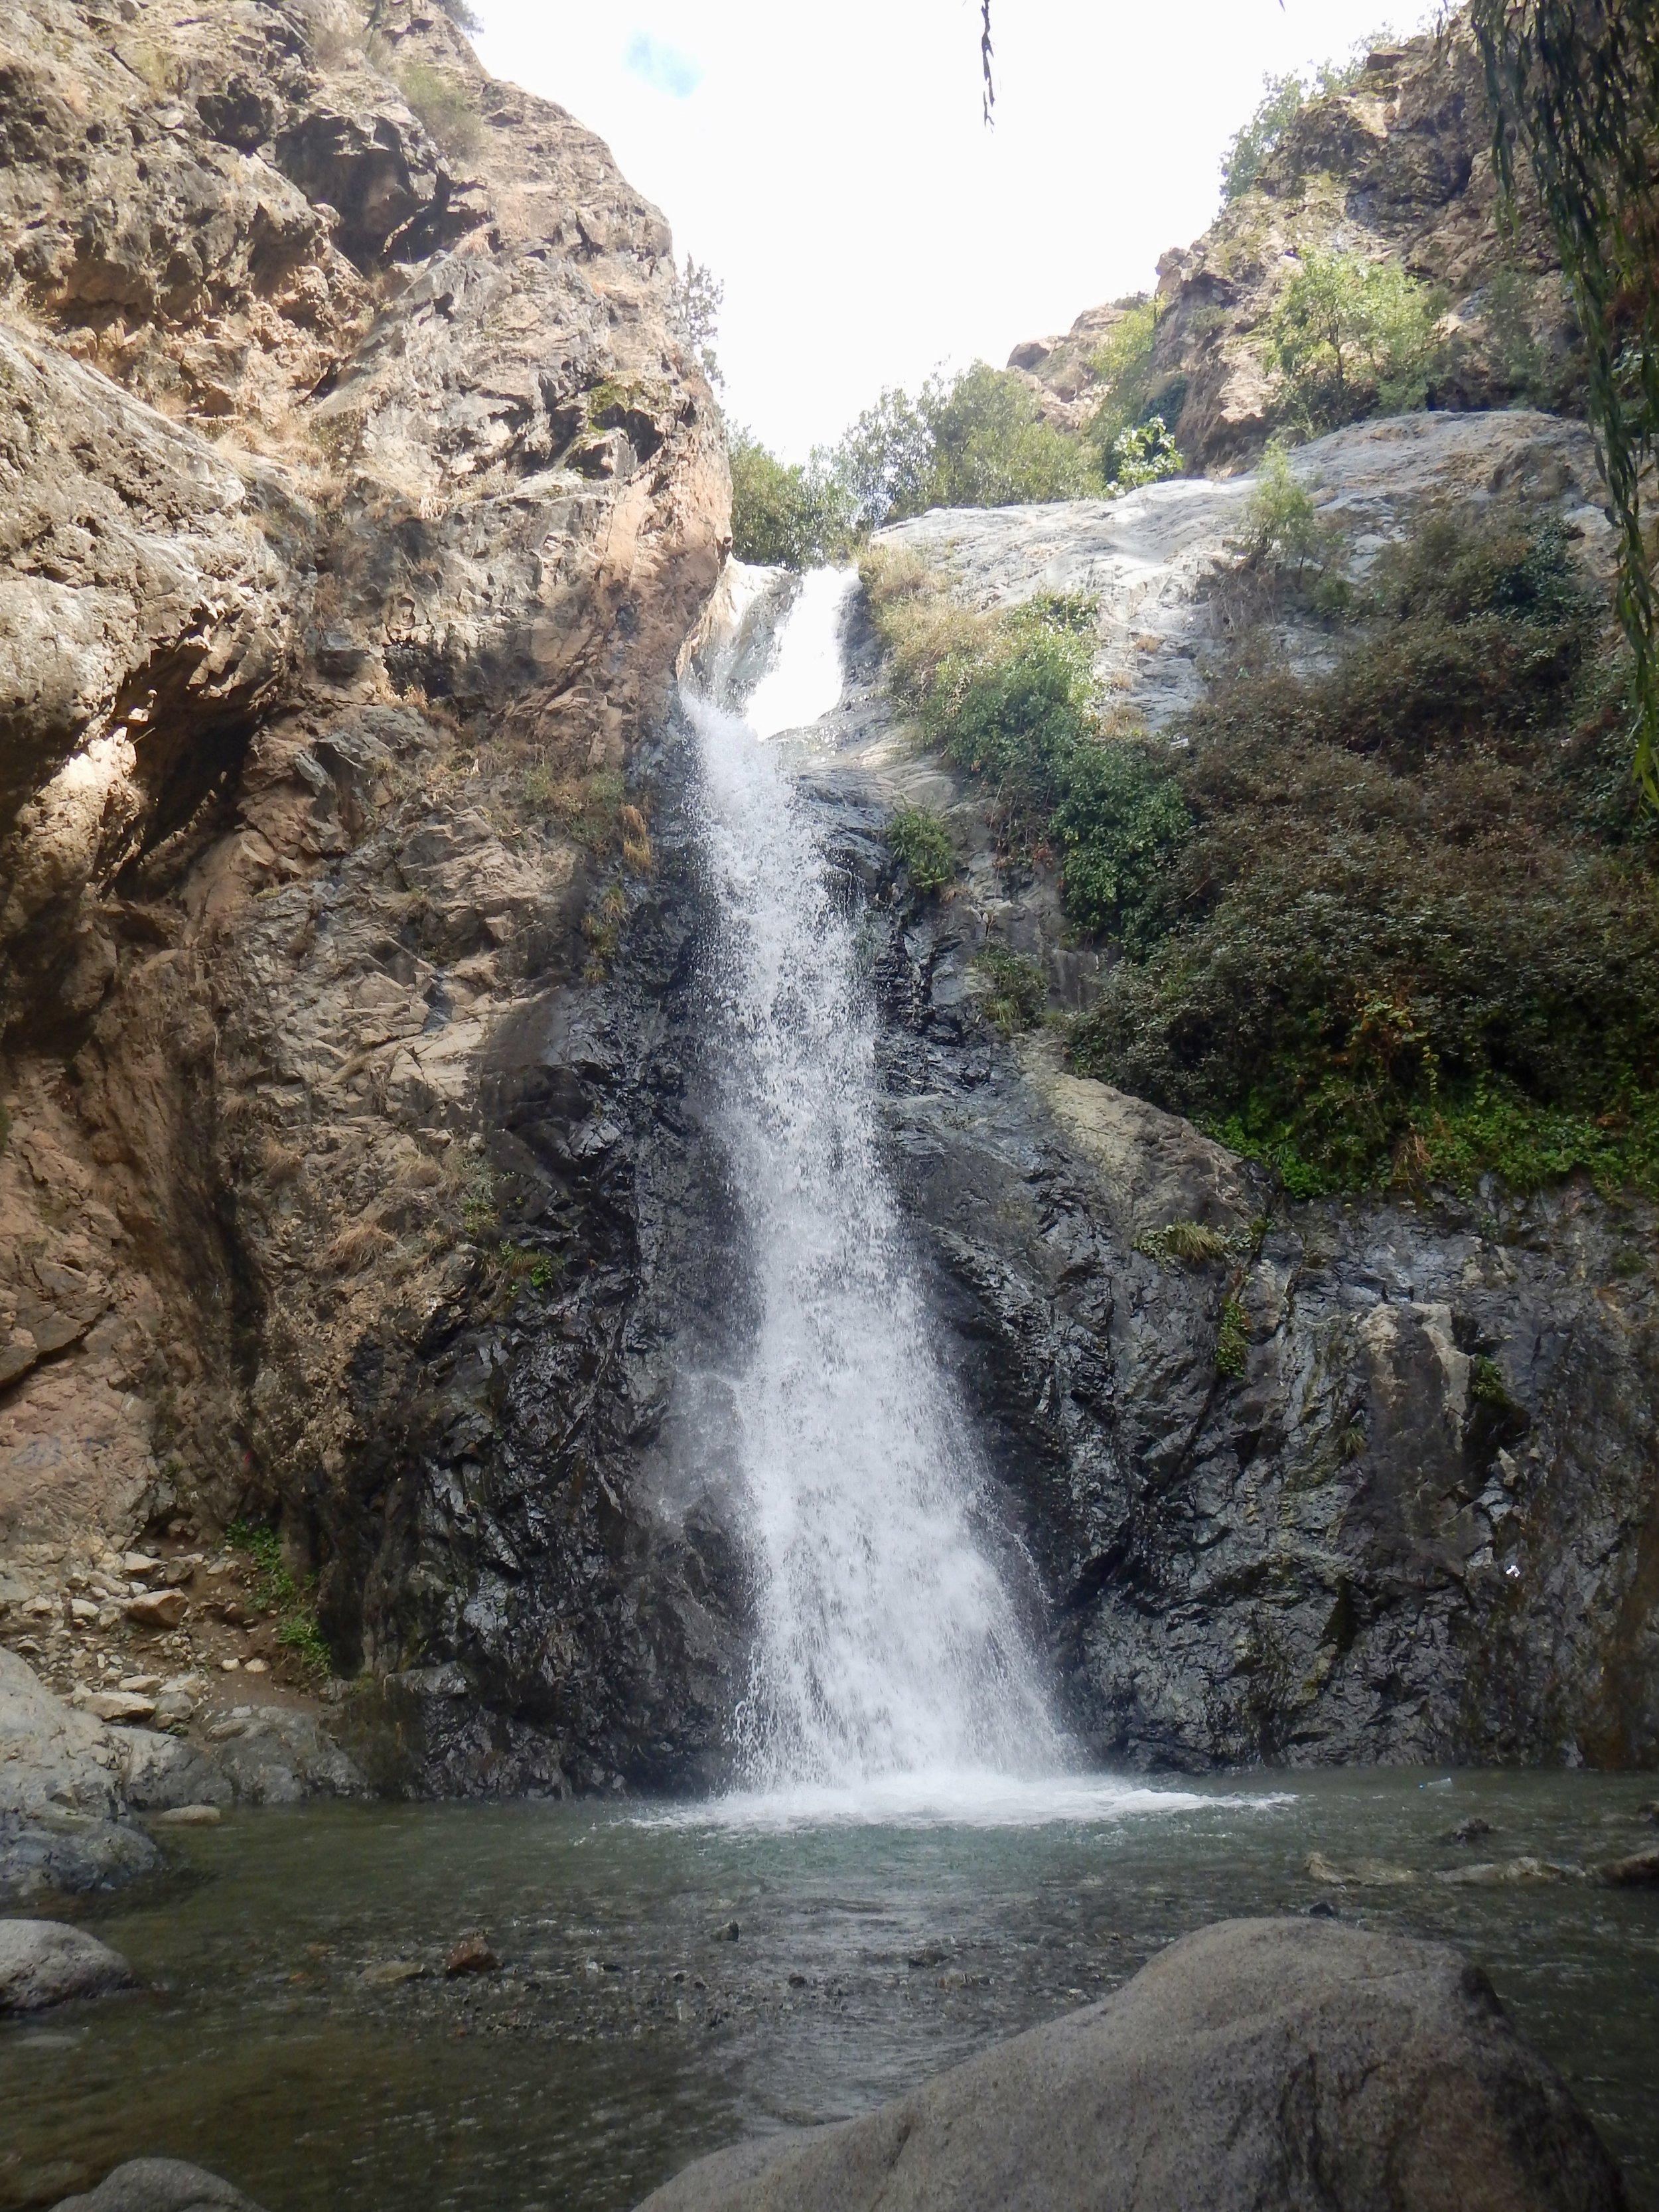 Waterfall near Ouzoud Falls, Marrackech, Morocco